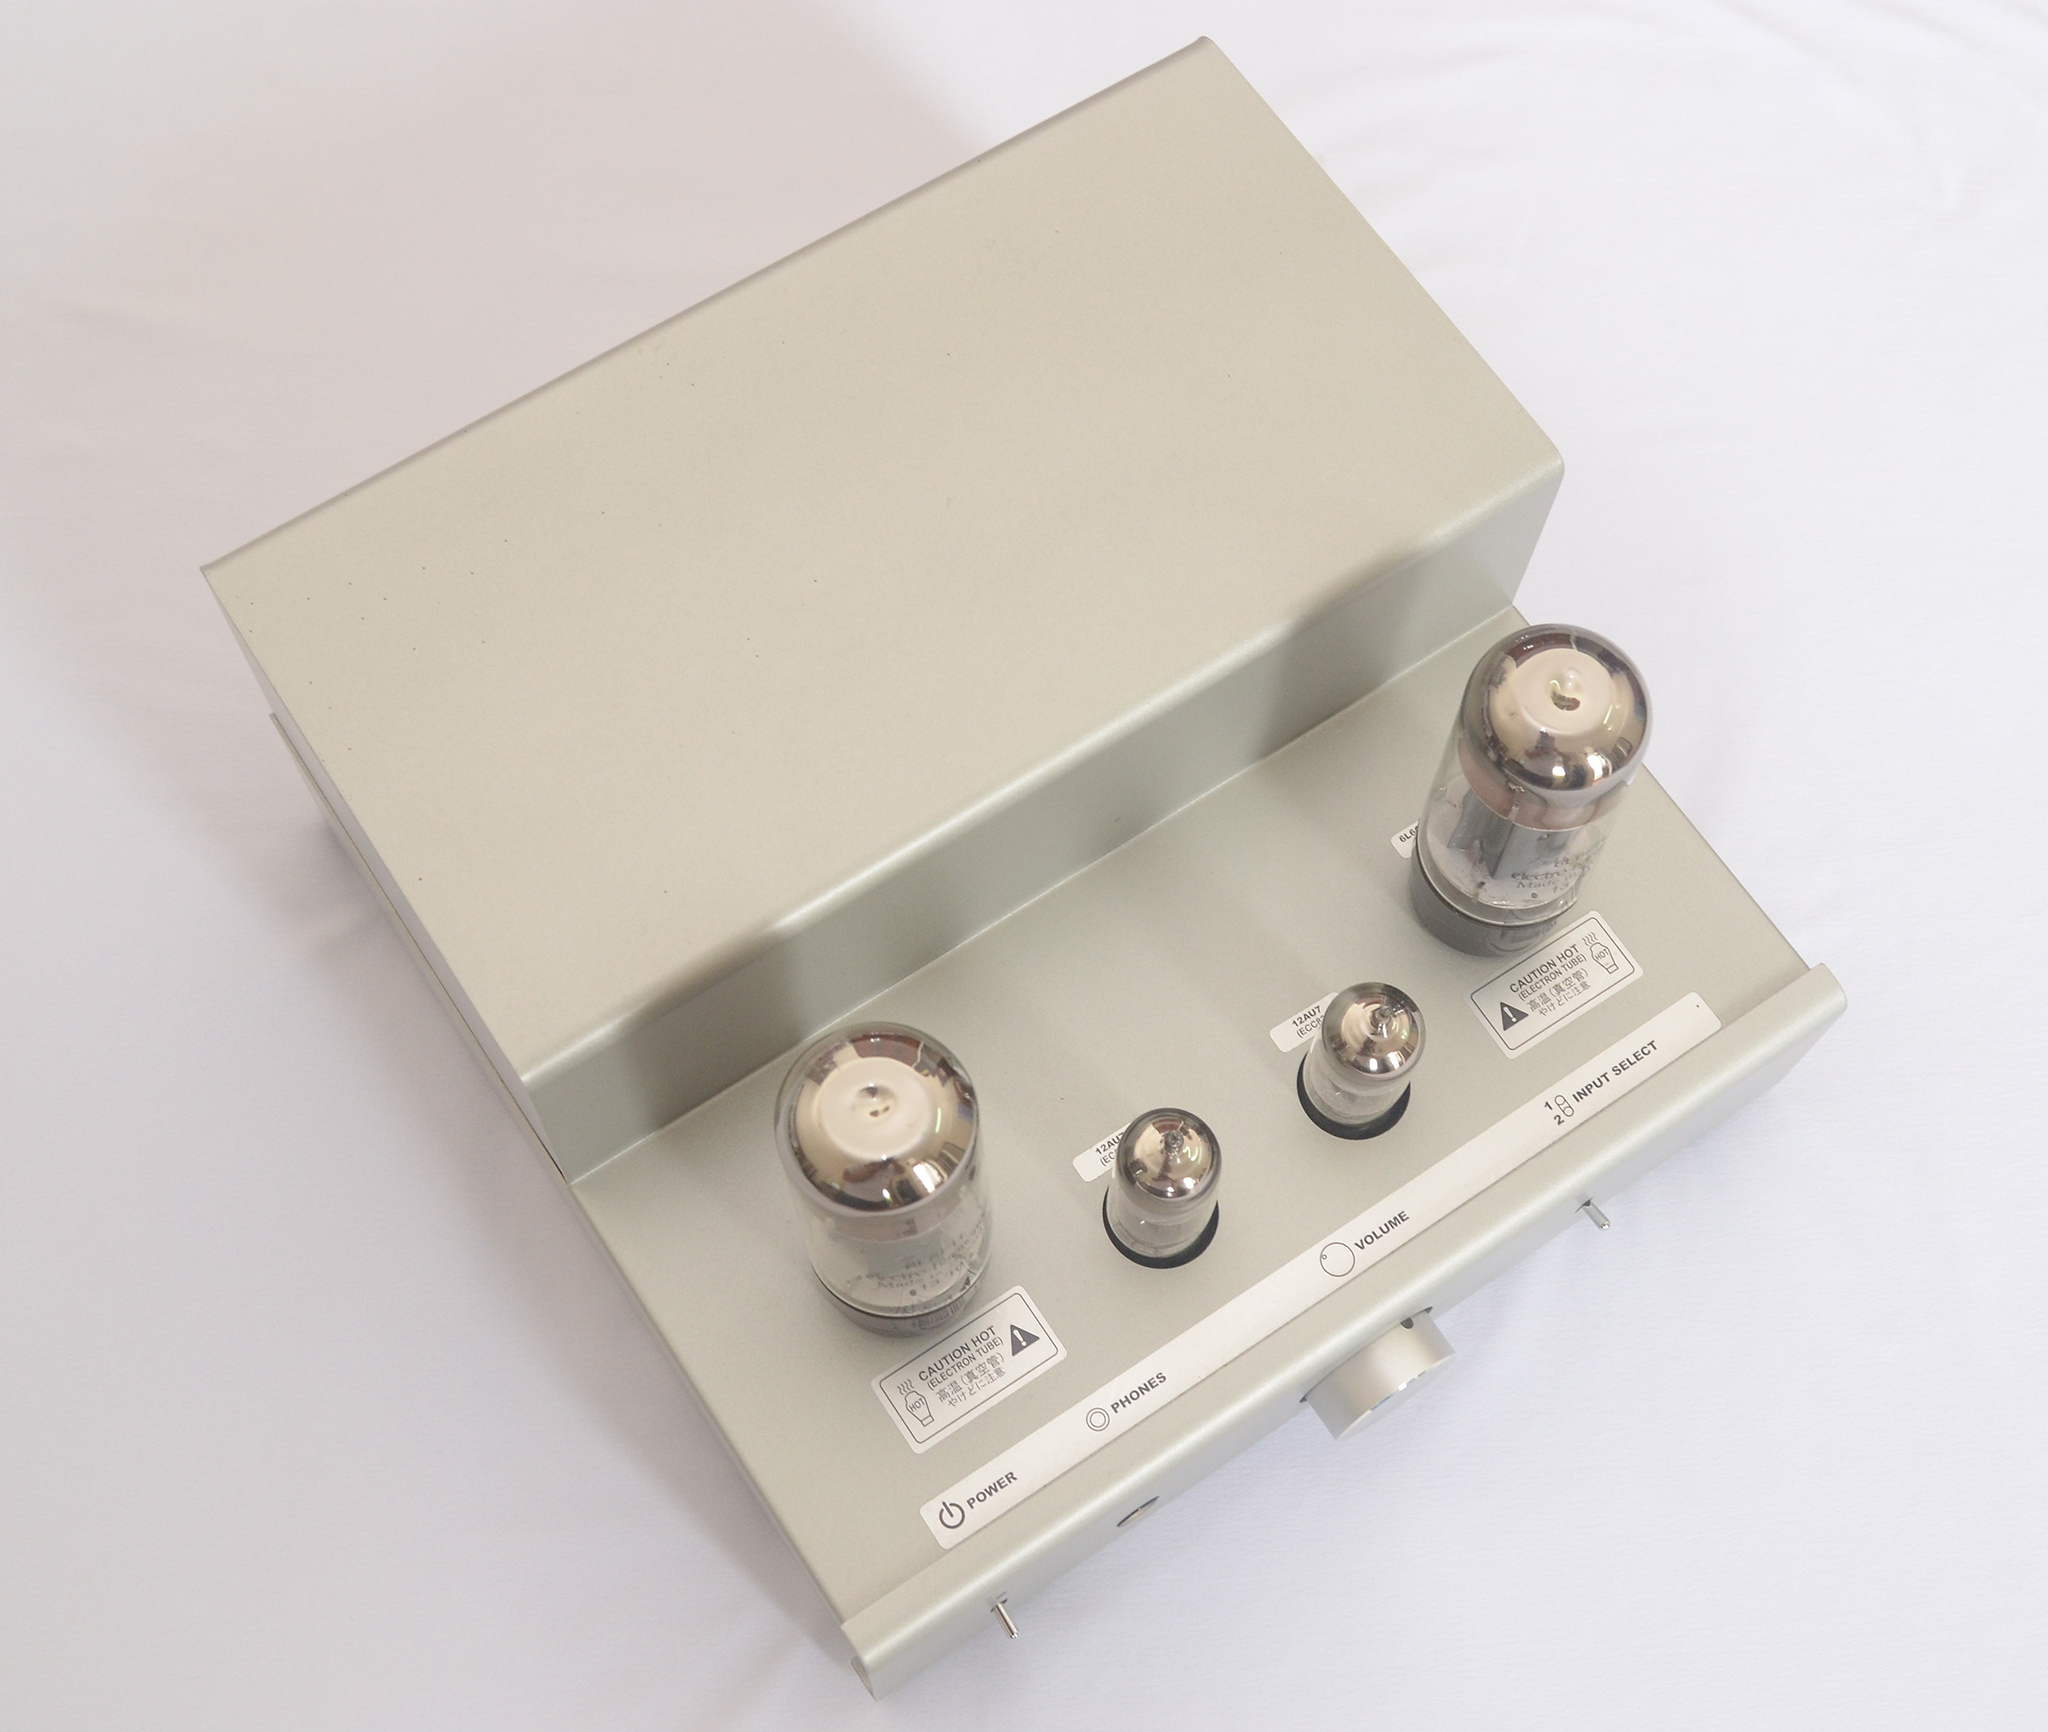 Elekit TU 8200 3